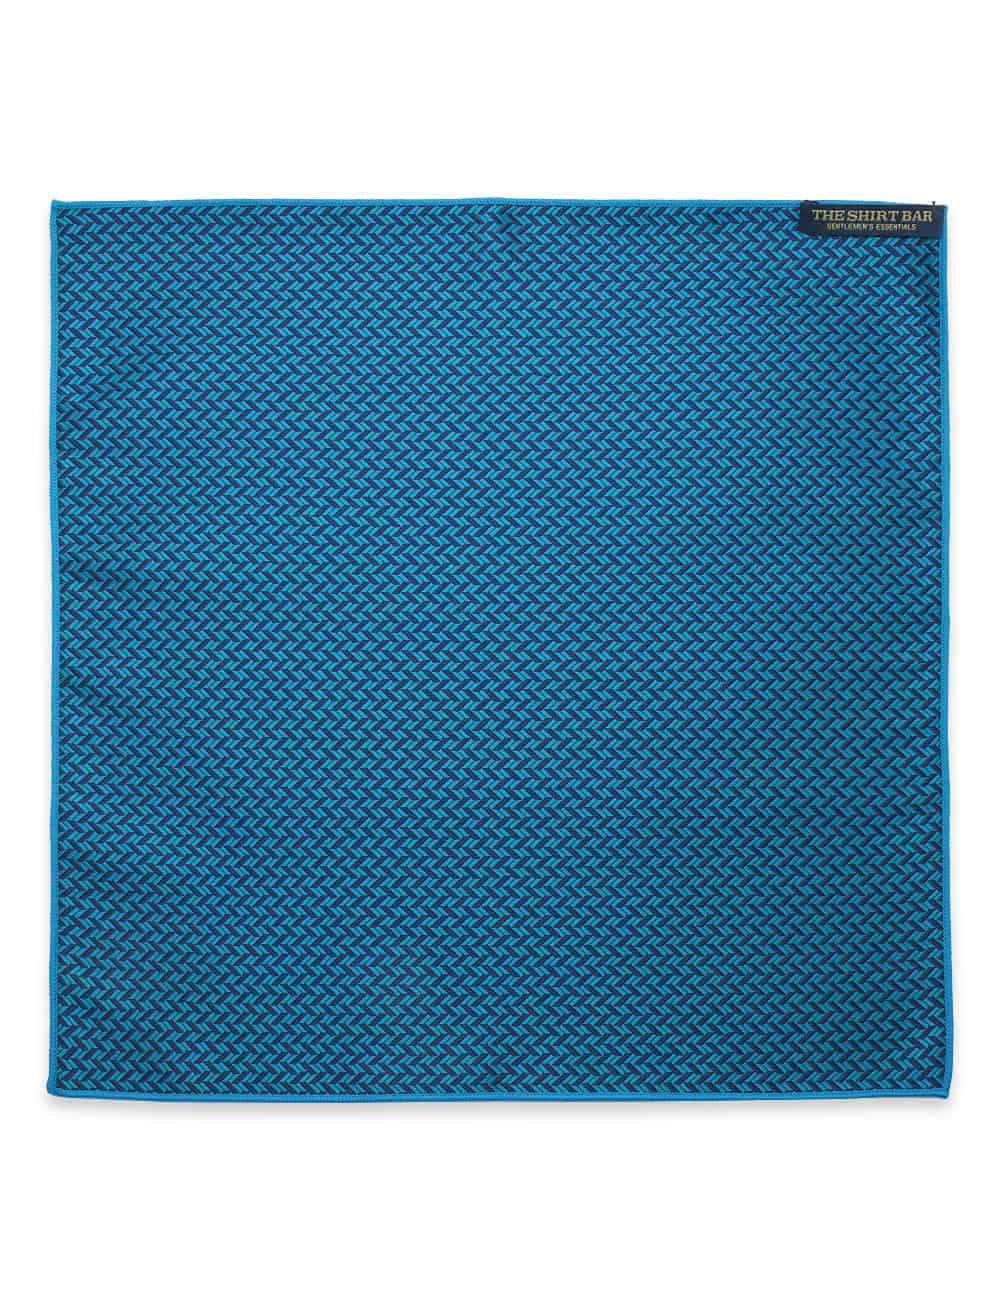 Navy and Blue Herringbone Woven Pocket Square PSQ58.9